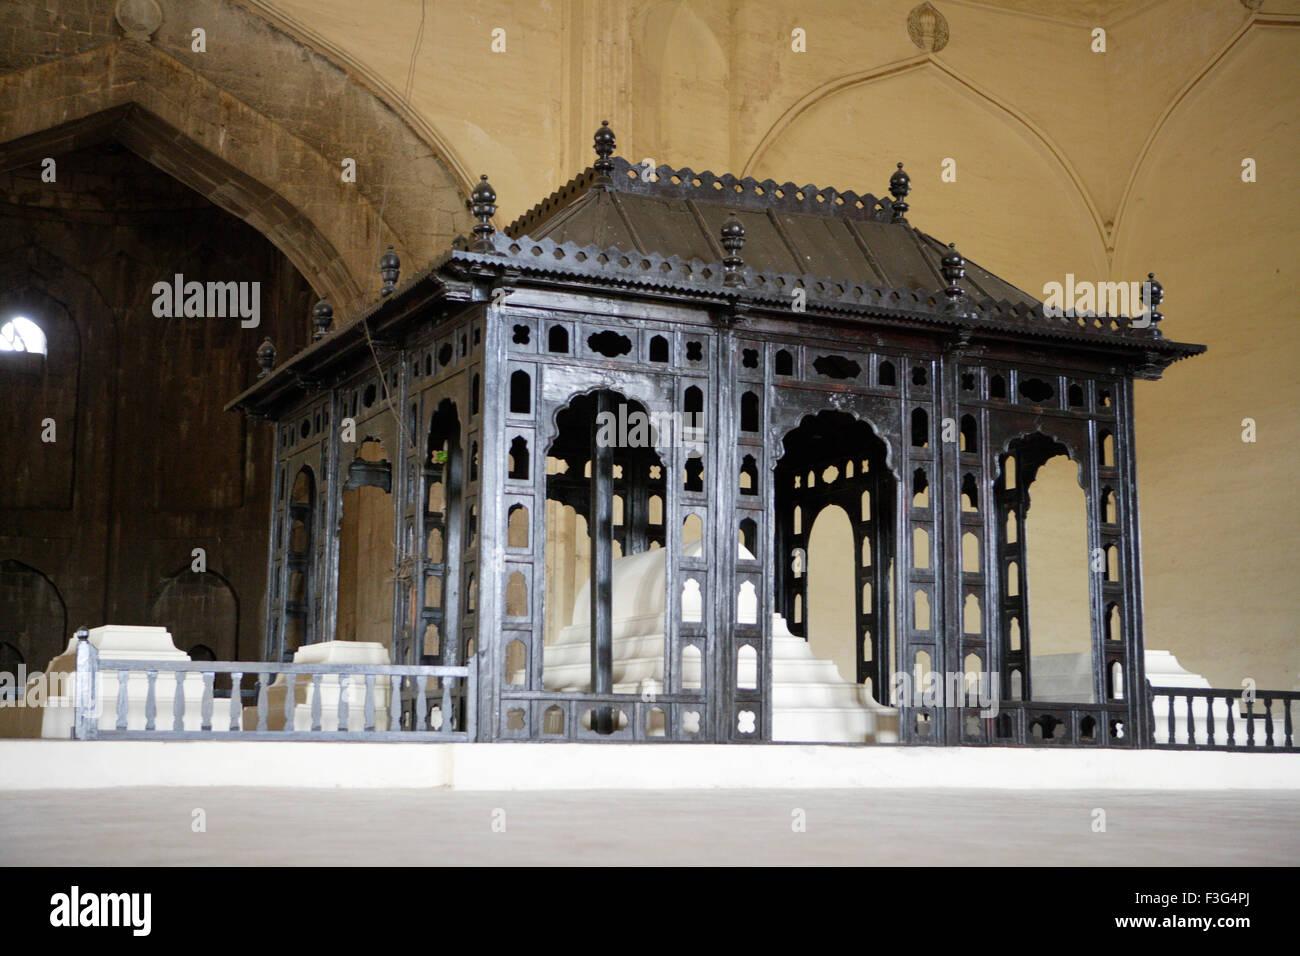 Gol Gumbaz ; built in 1659 ; Mausoleum of Muhammad Adil Shah II (1627 57) Bijapur ; Karnataka - Stock Image